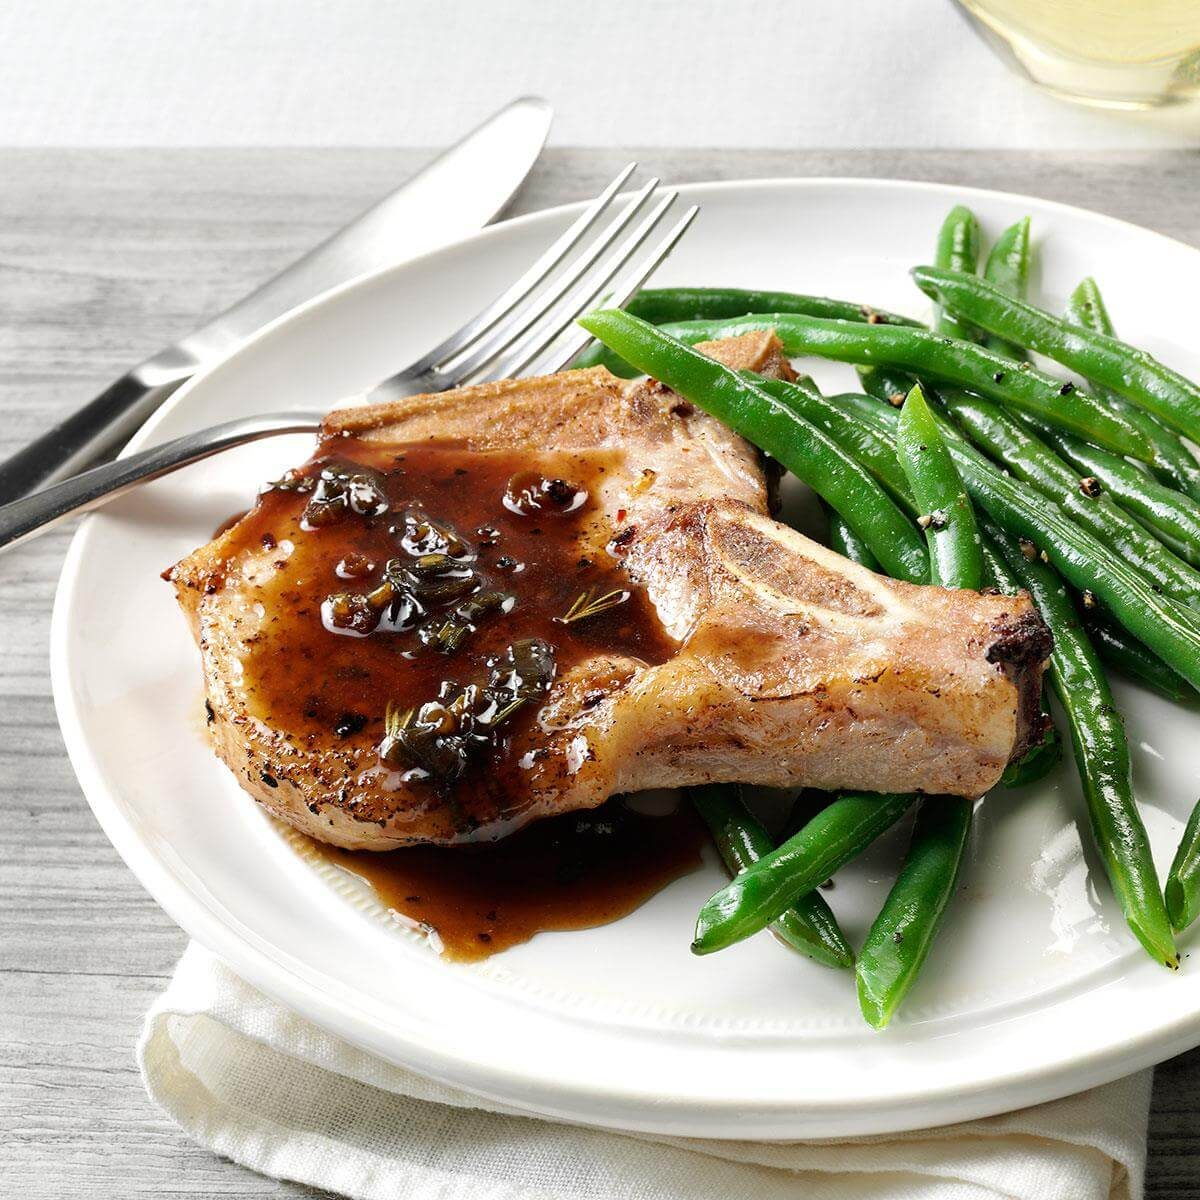 Pork Chops with Honey-Balsamic Glaze